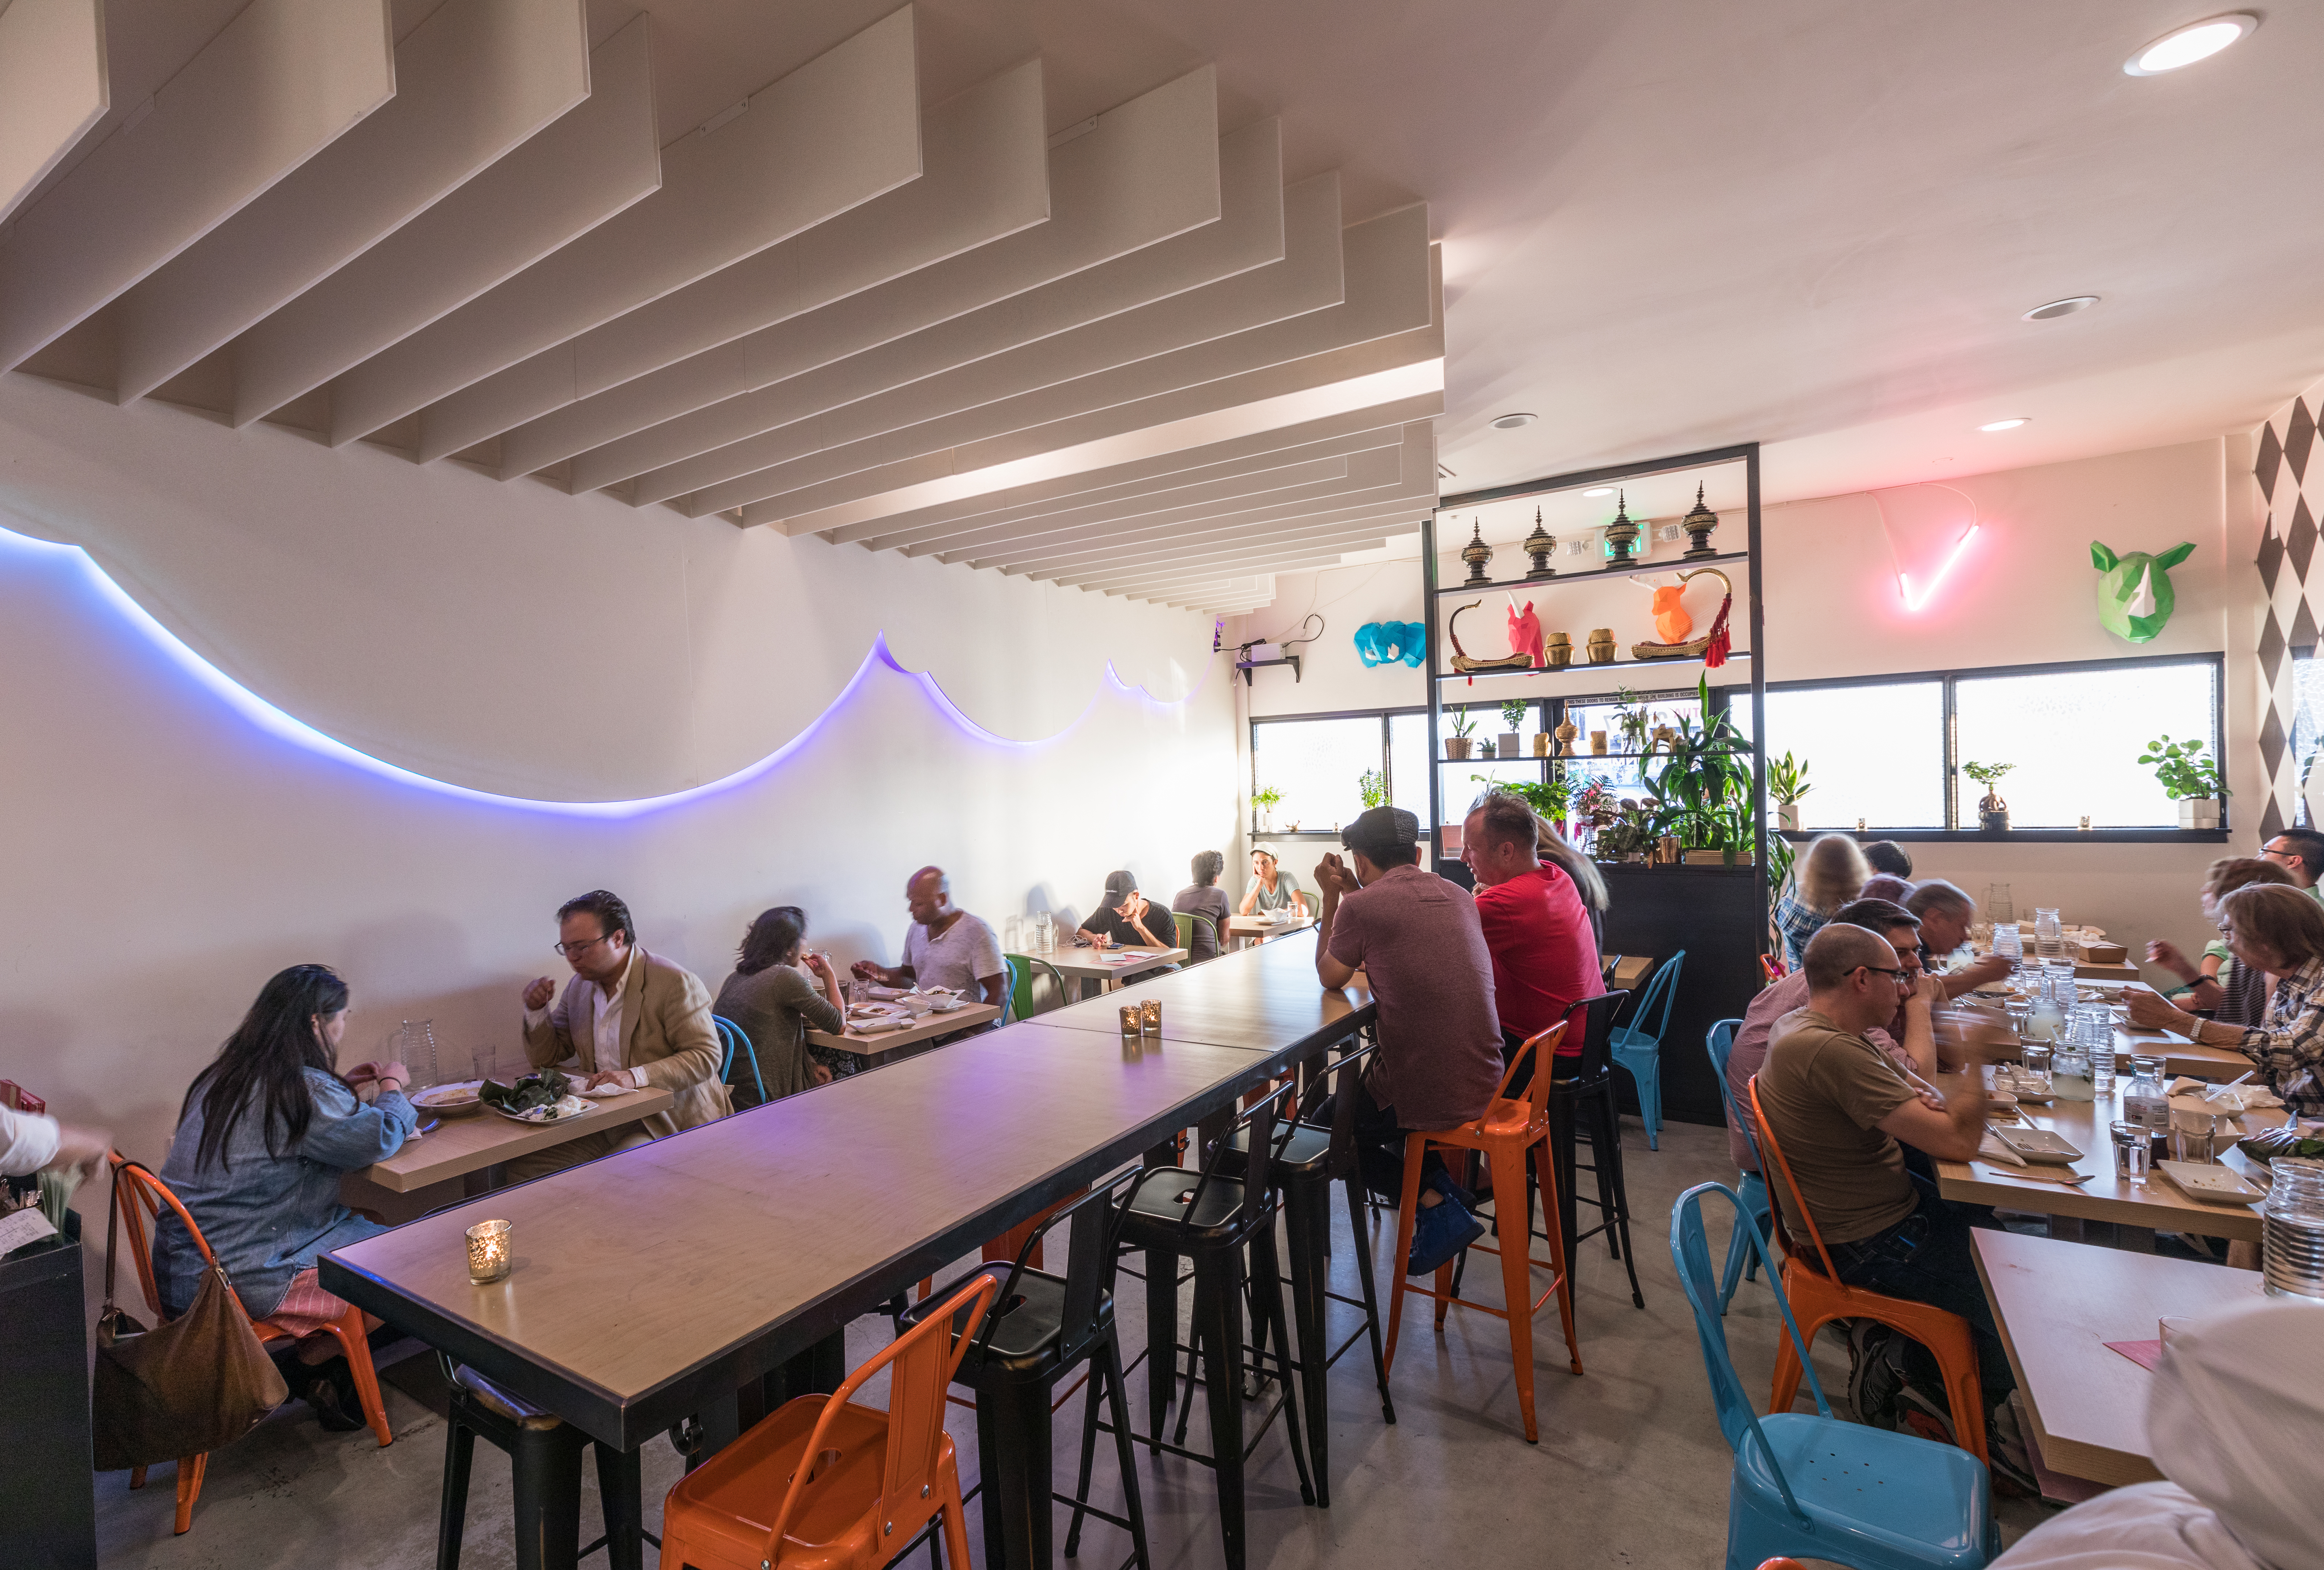 Ep-Simple-Baffle-Restaurant-Hospitality-Ceiling-Myanmar-Jakob-Layman-1